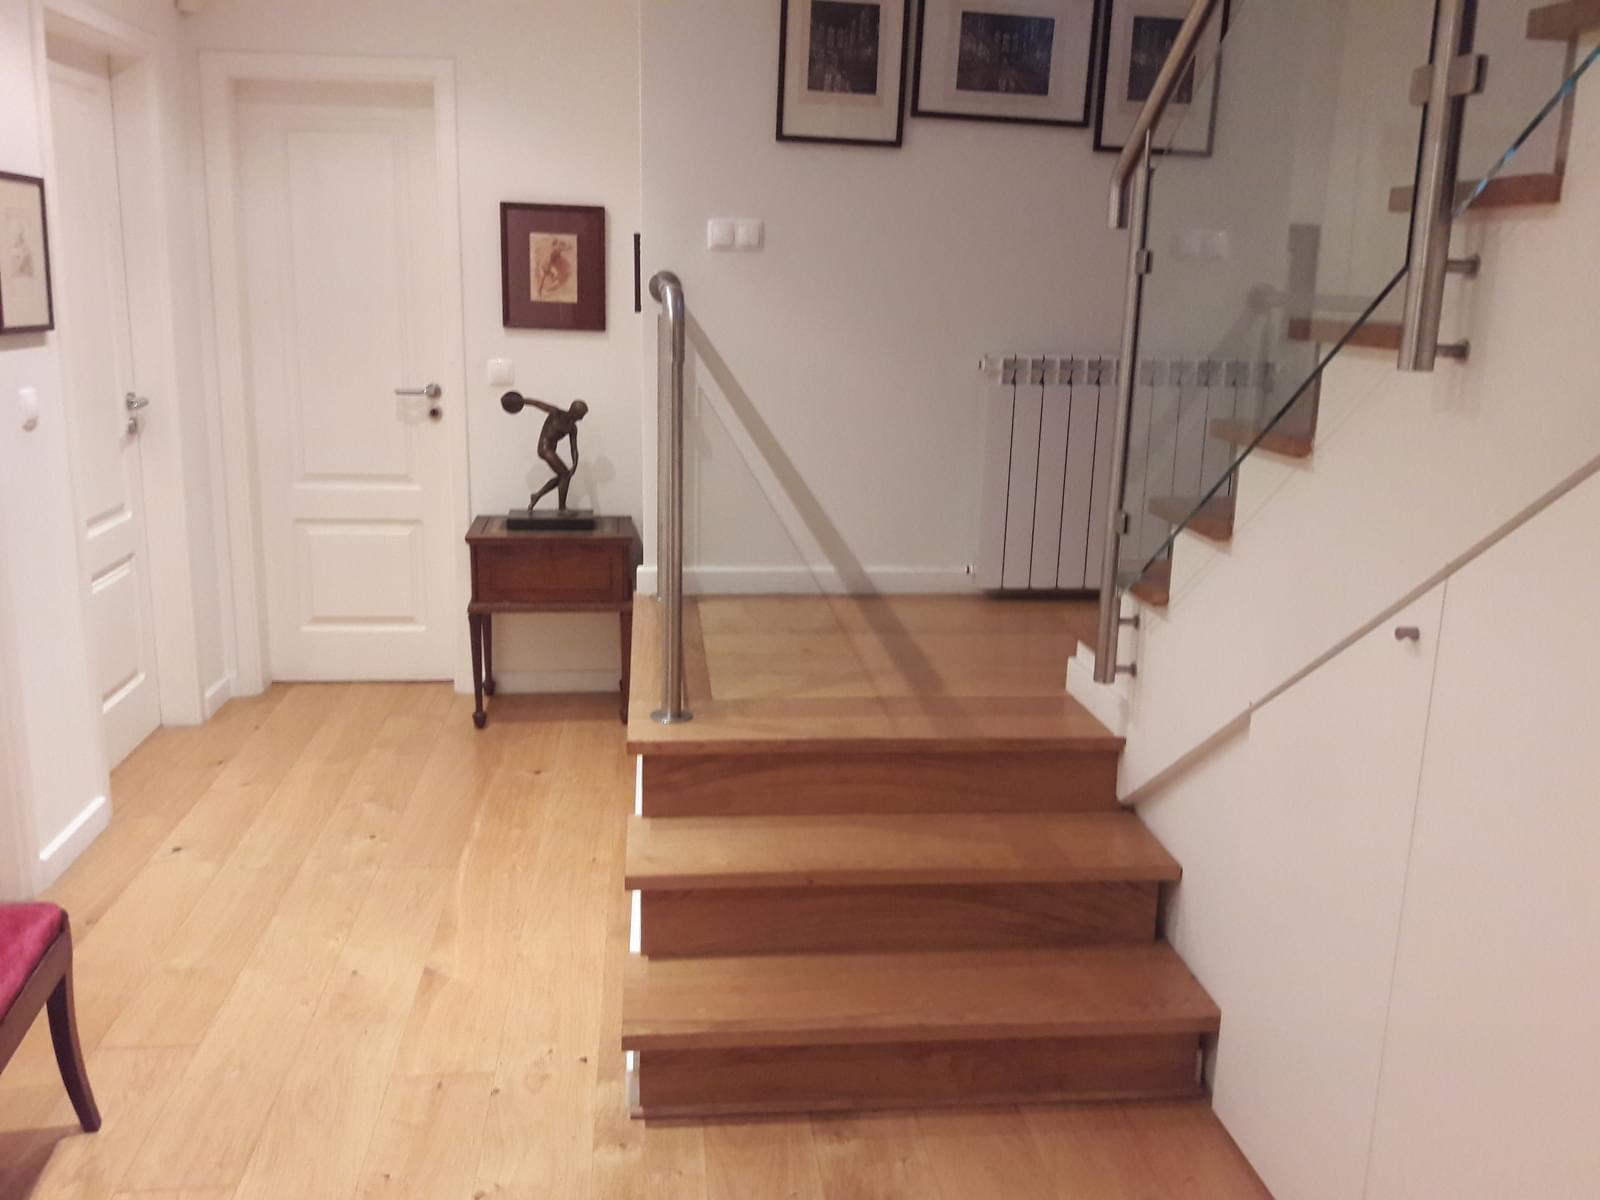 pf1888-apartamento-t4-cascais-8ce728b2-b071-487b-bc1c-043524ee3277